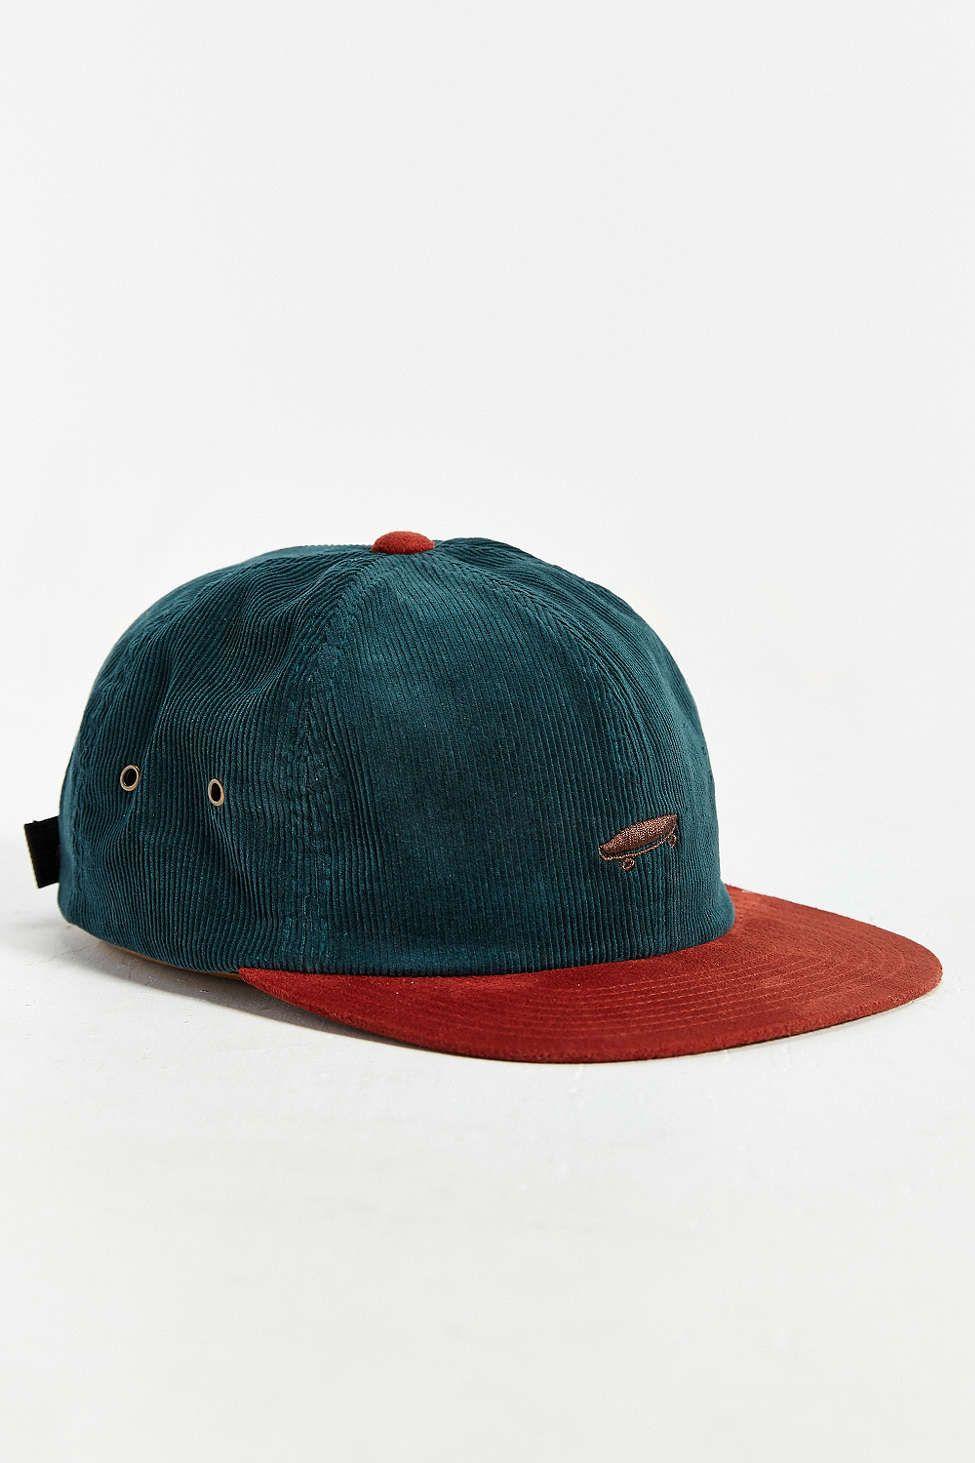 Vans Salton Snapback Hat Dope Hats 7b4a760a5e0d